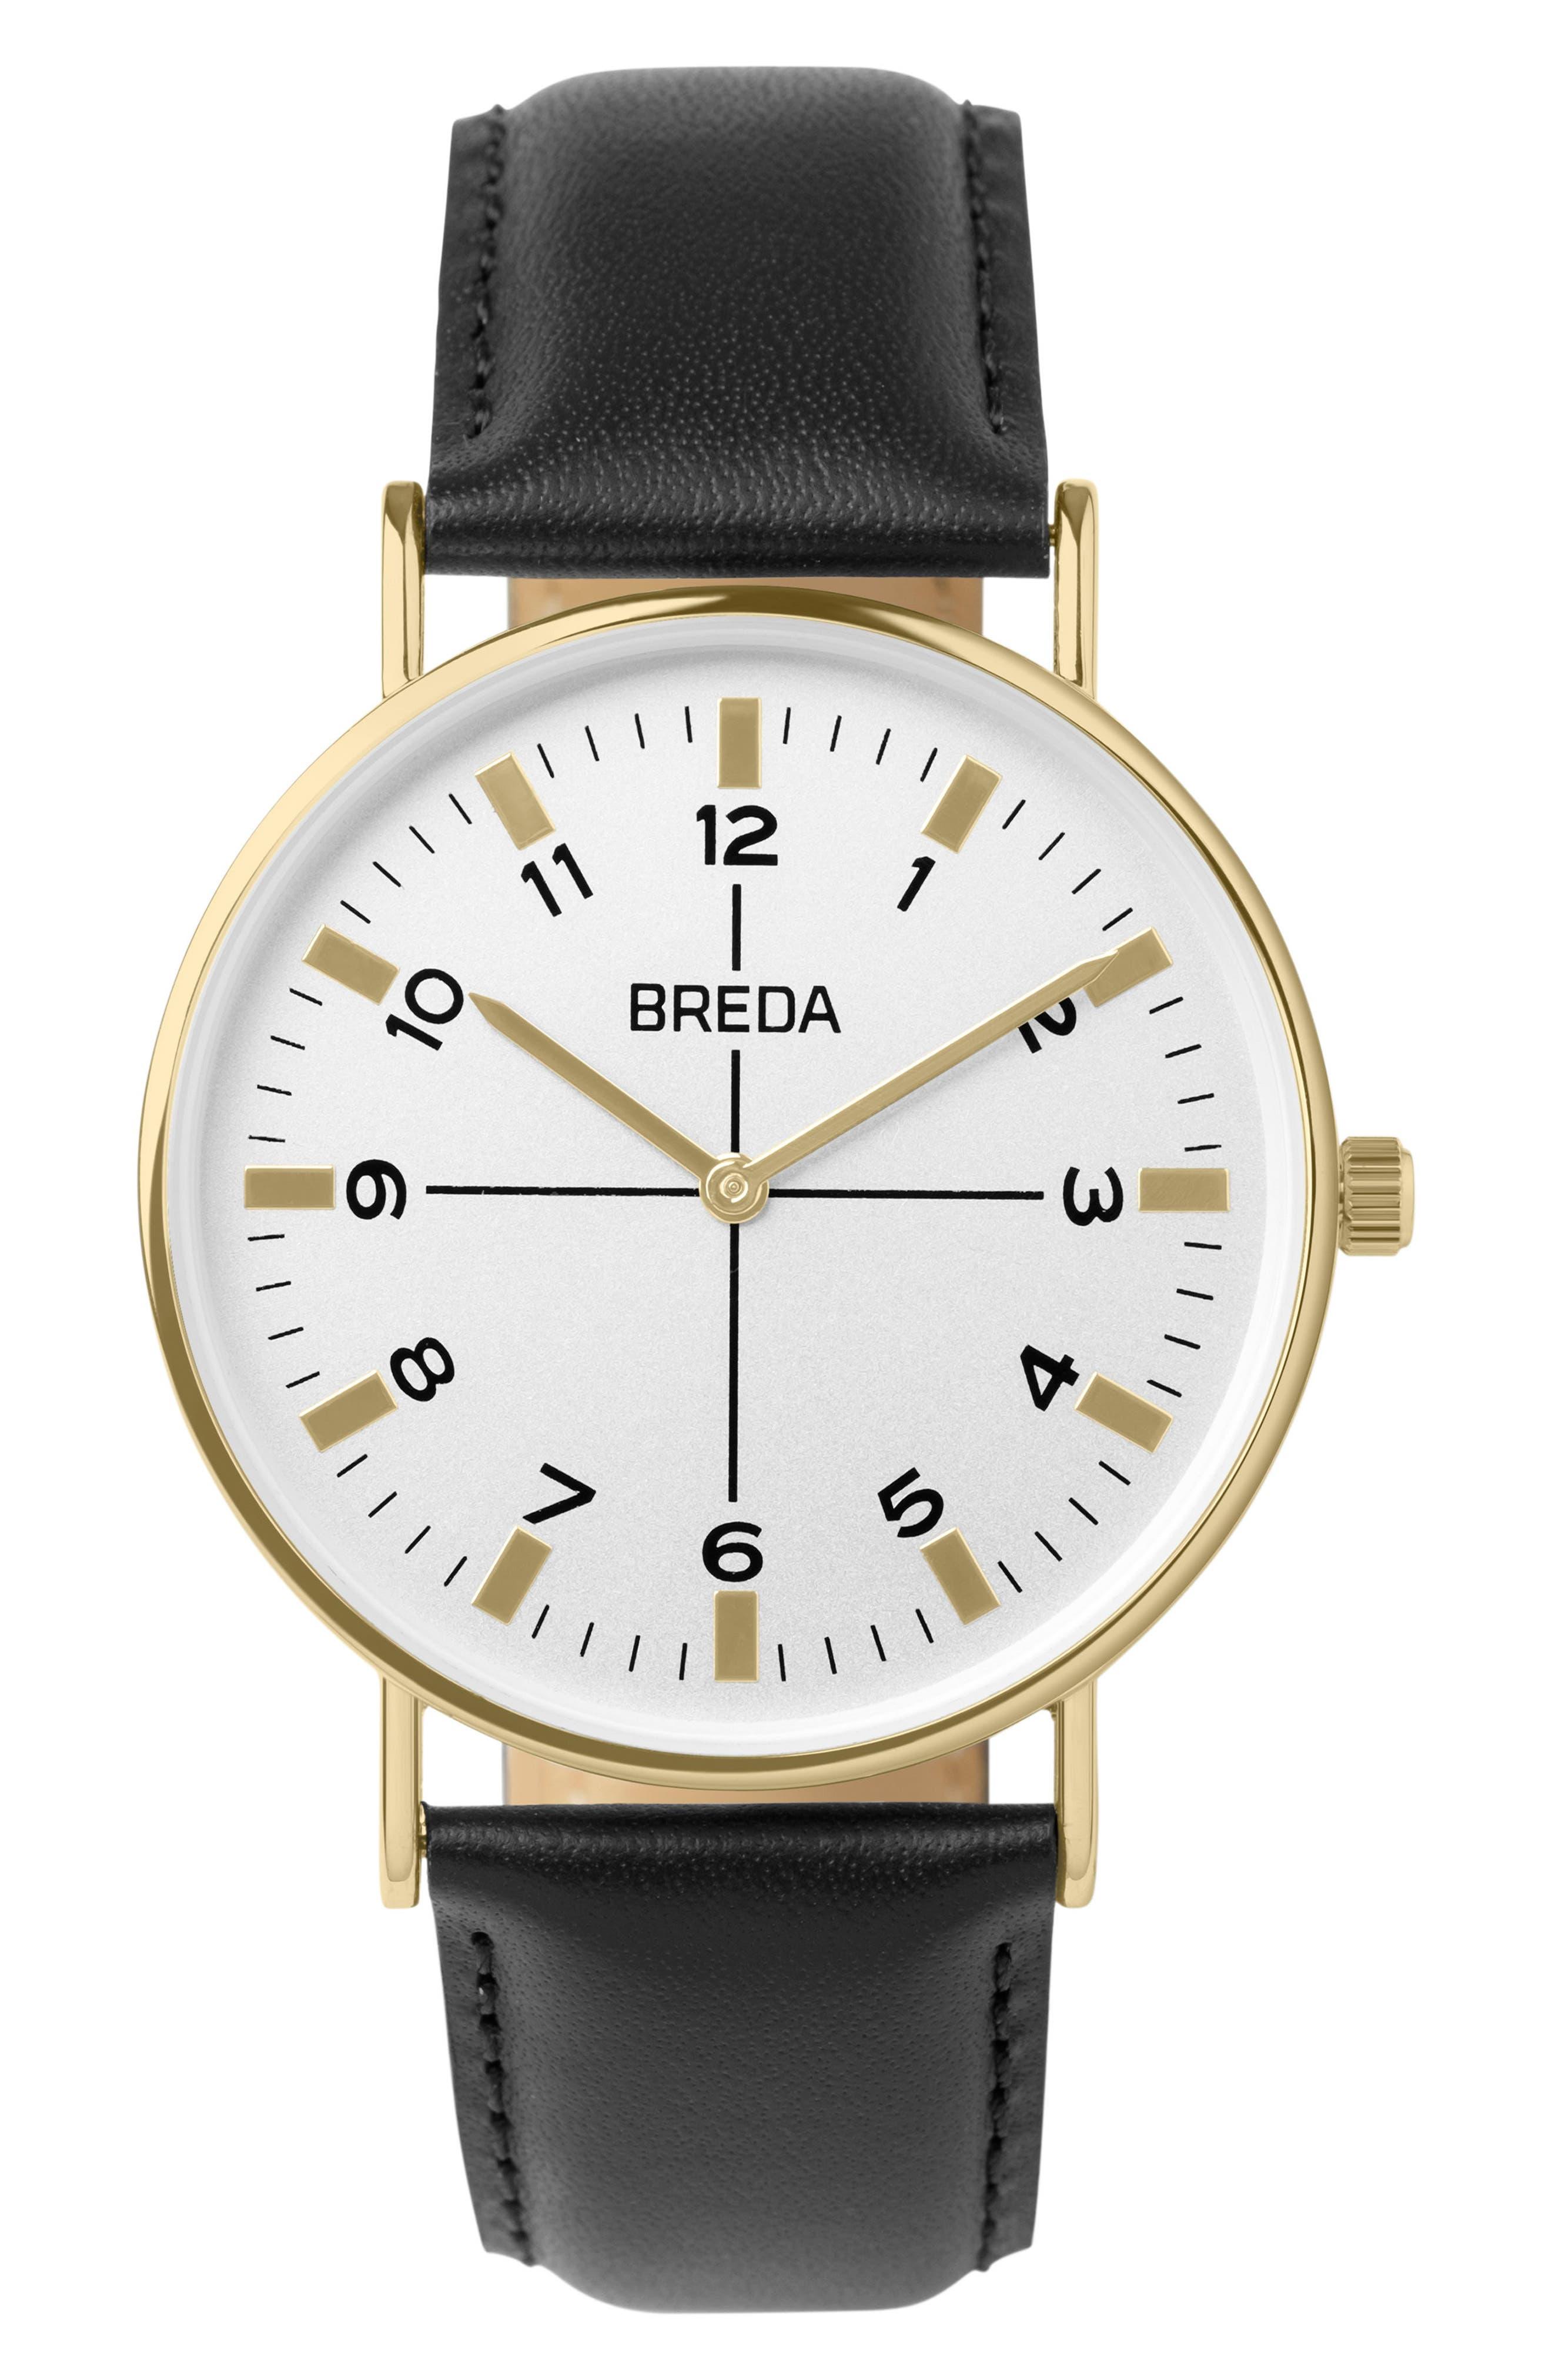 Main Image - BREDA Belmont Slim Leather Strap Watch, 40mm